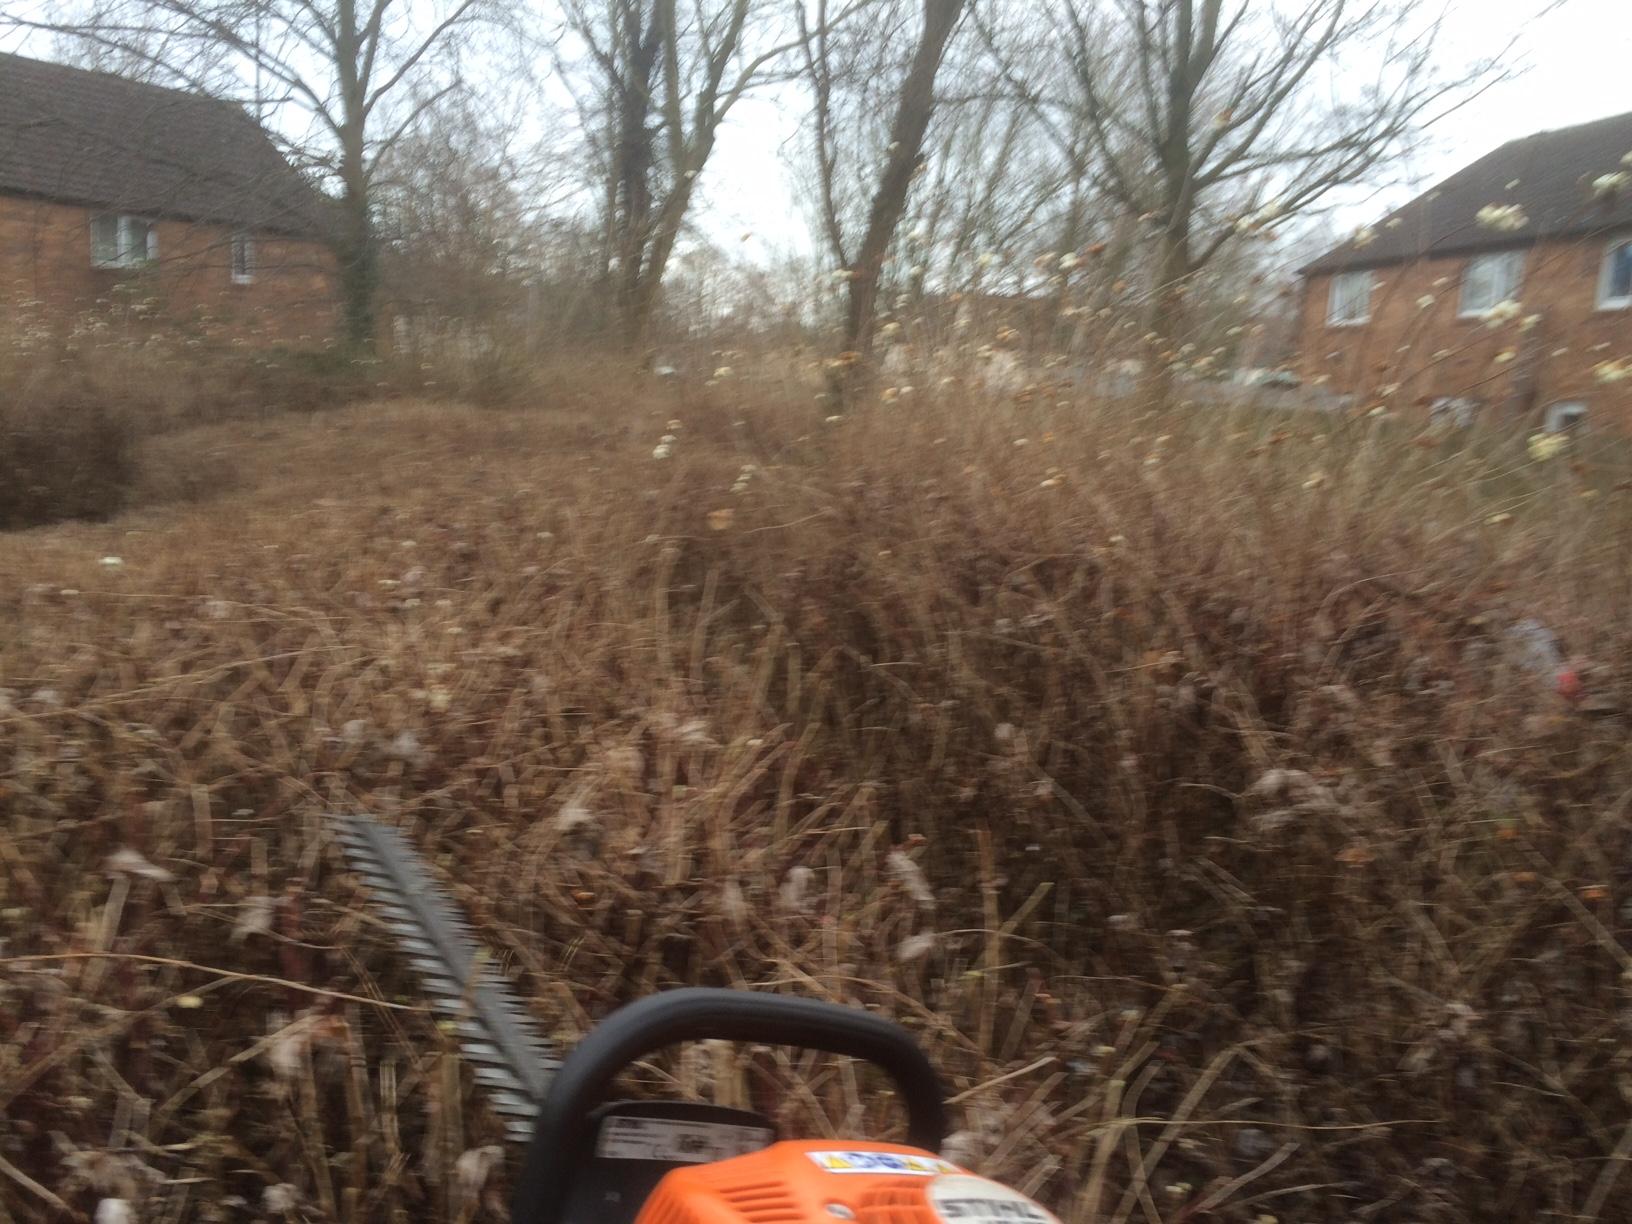 04/01/17 bushes